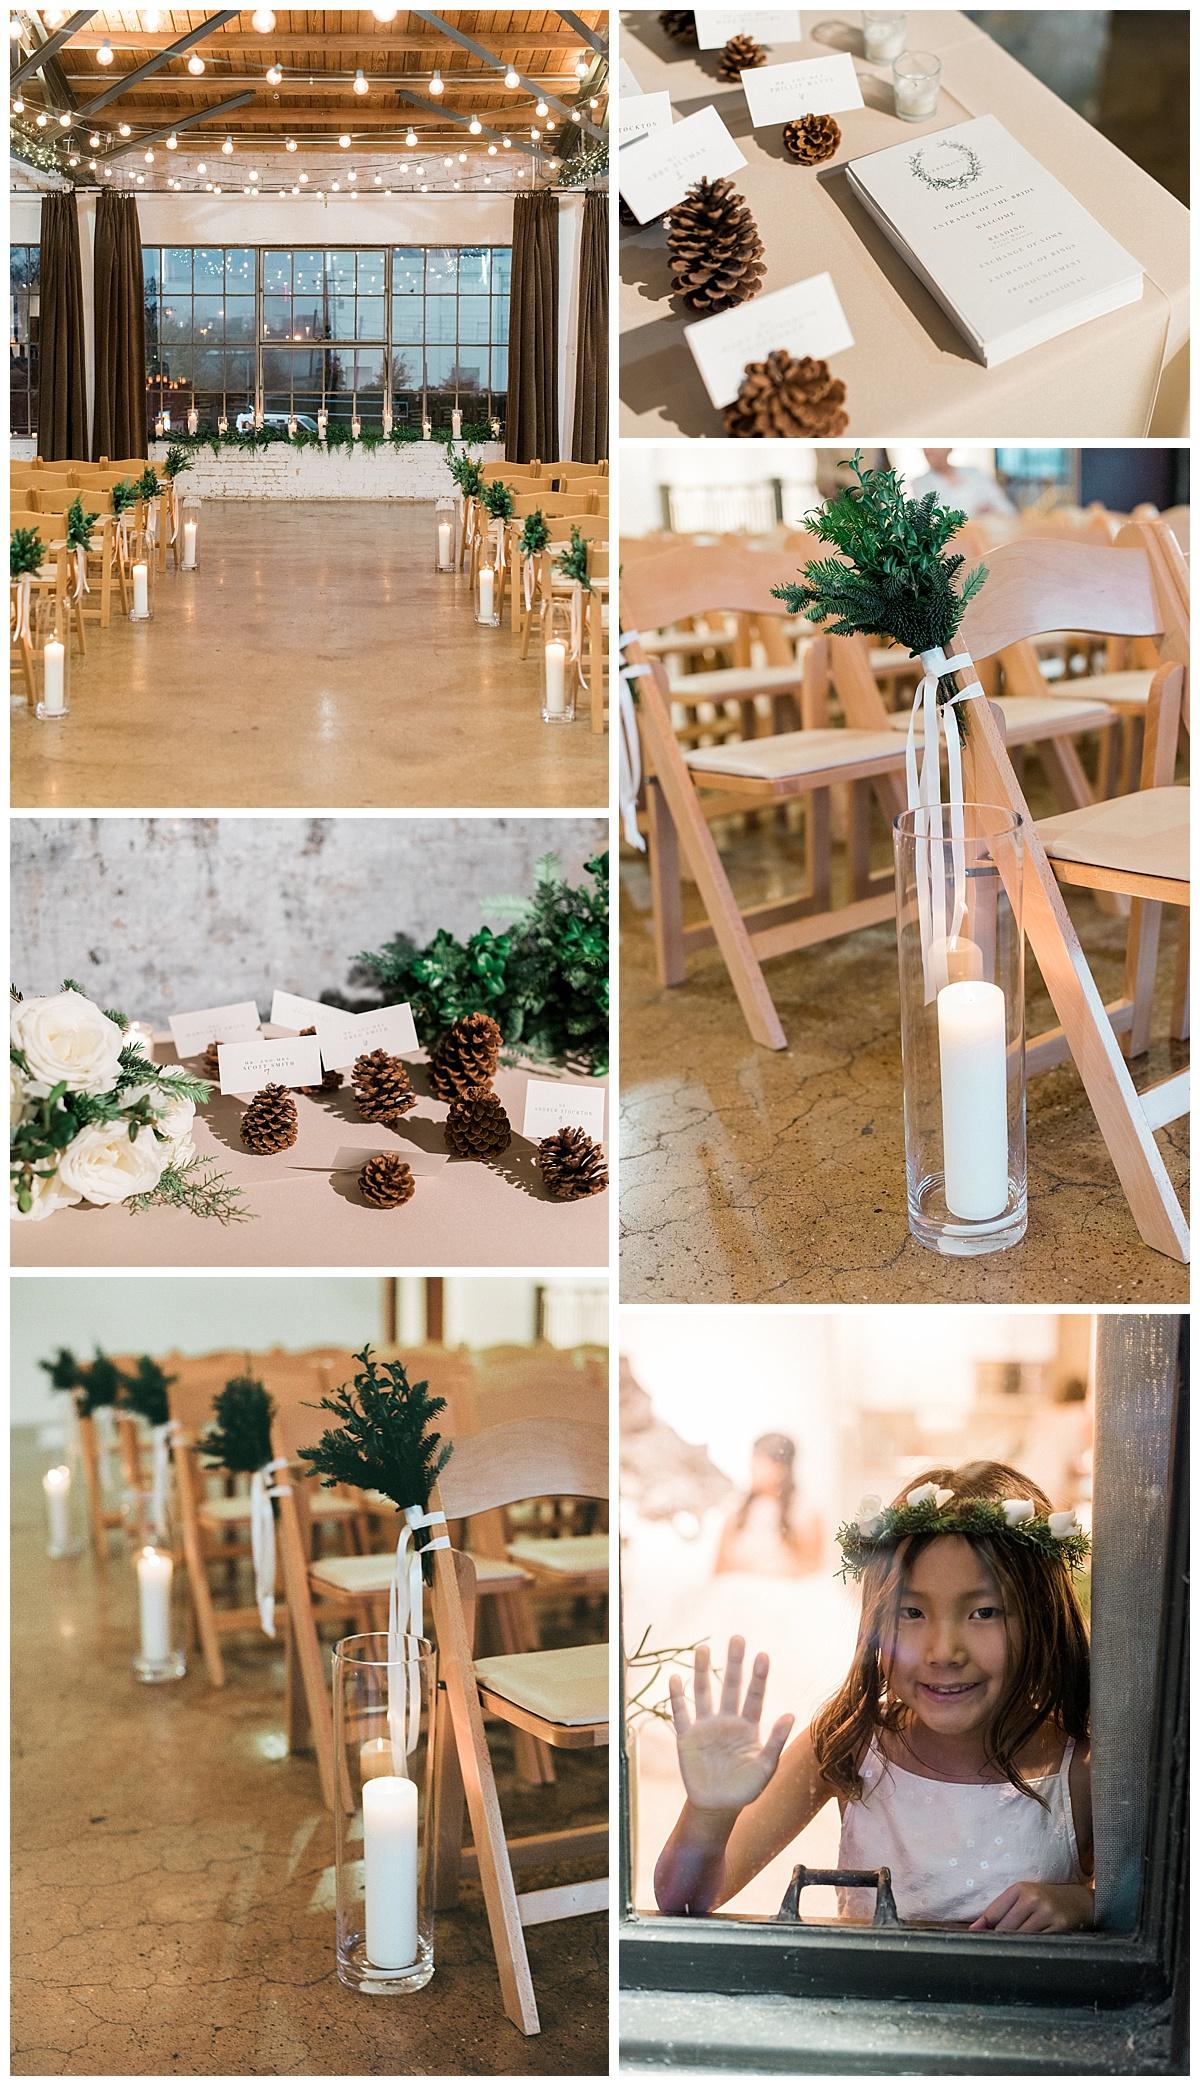 hickory-street-annex-wedding-ar-photography-10.jpg